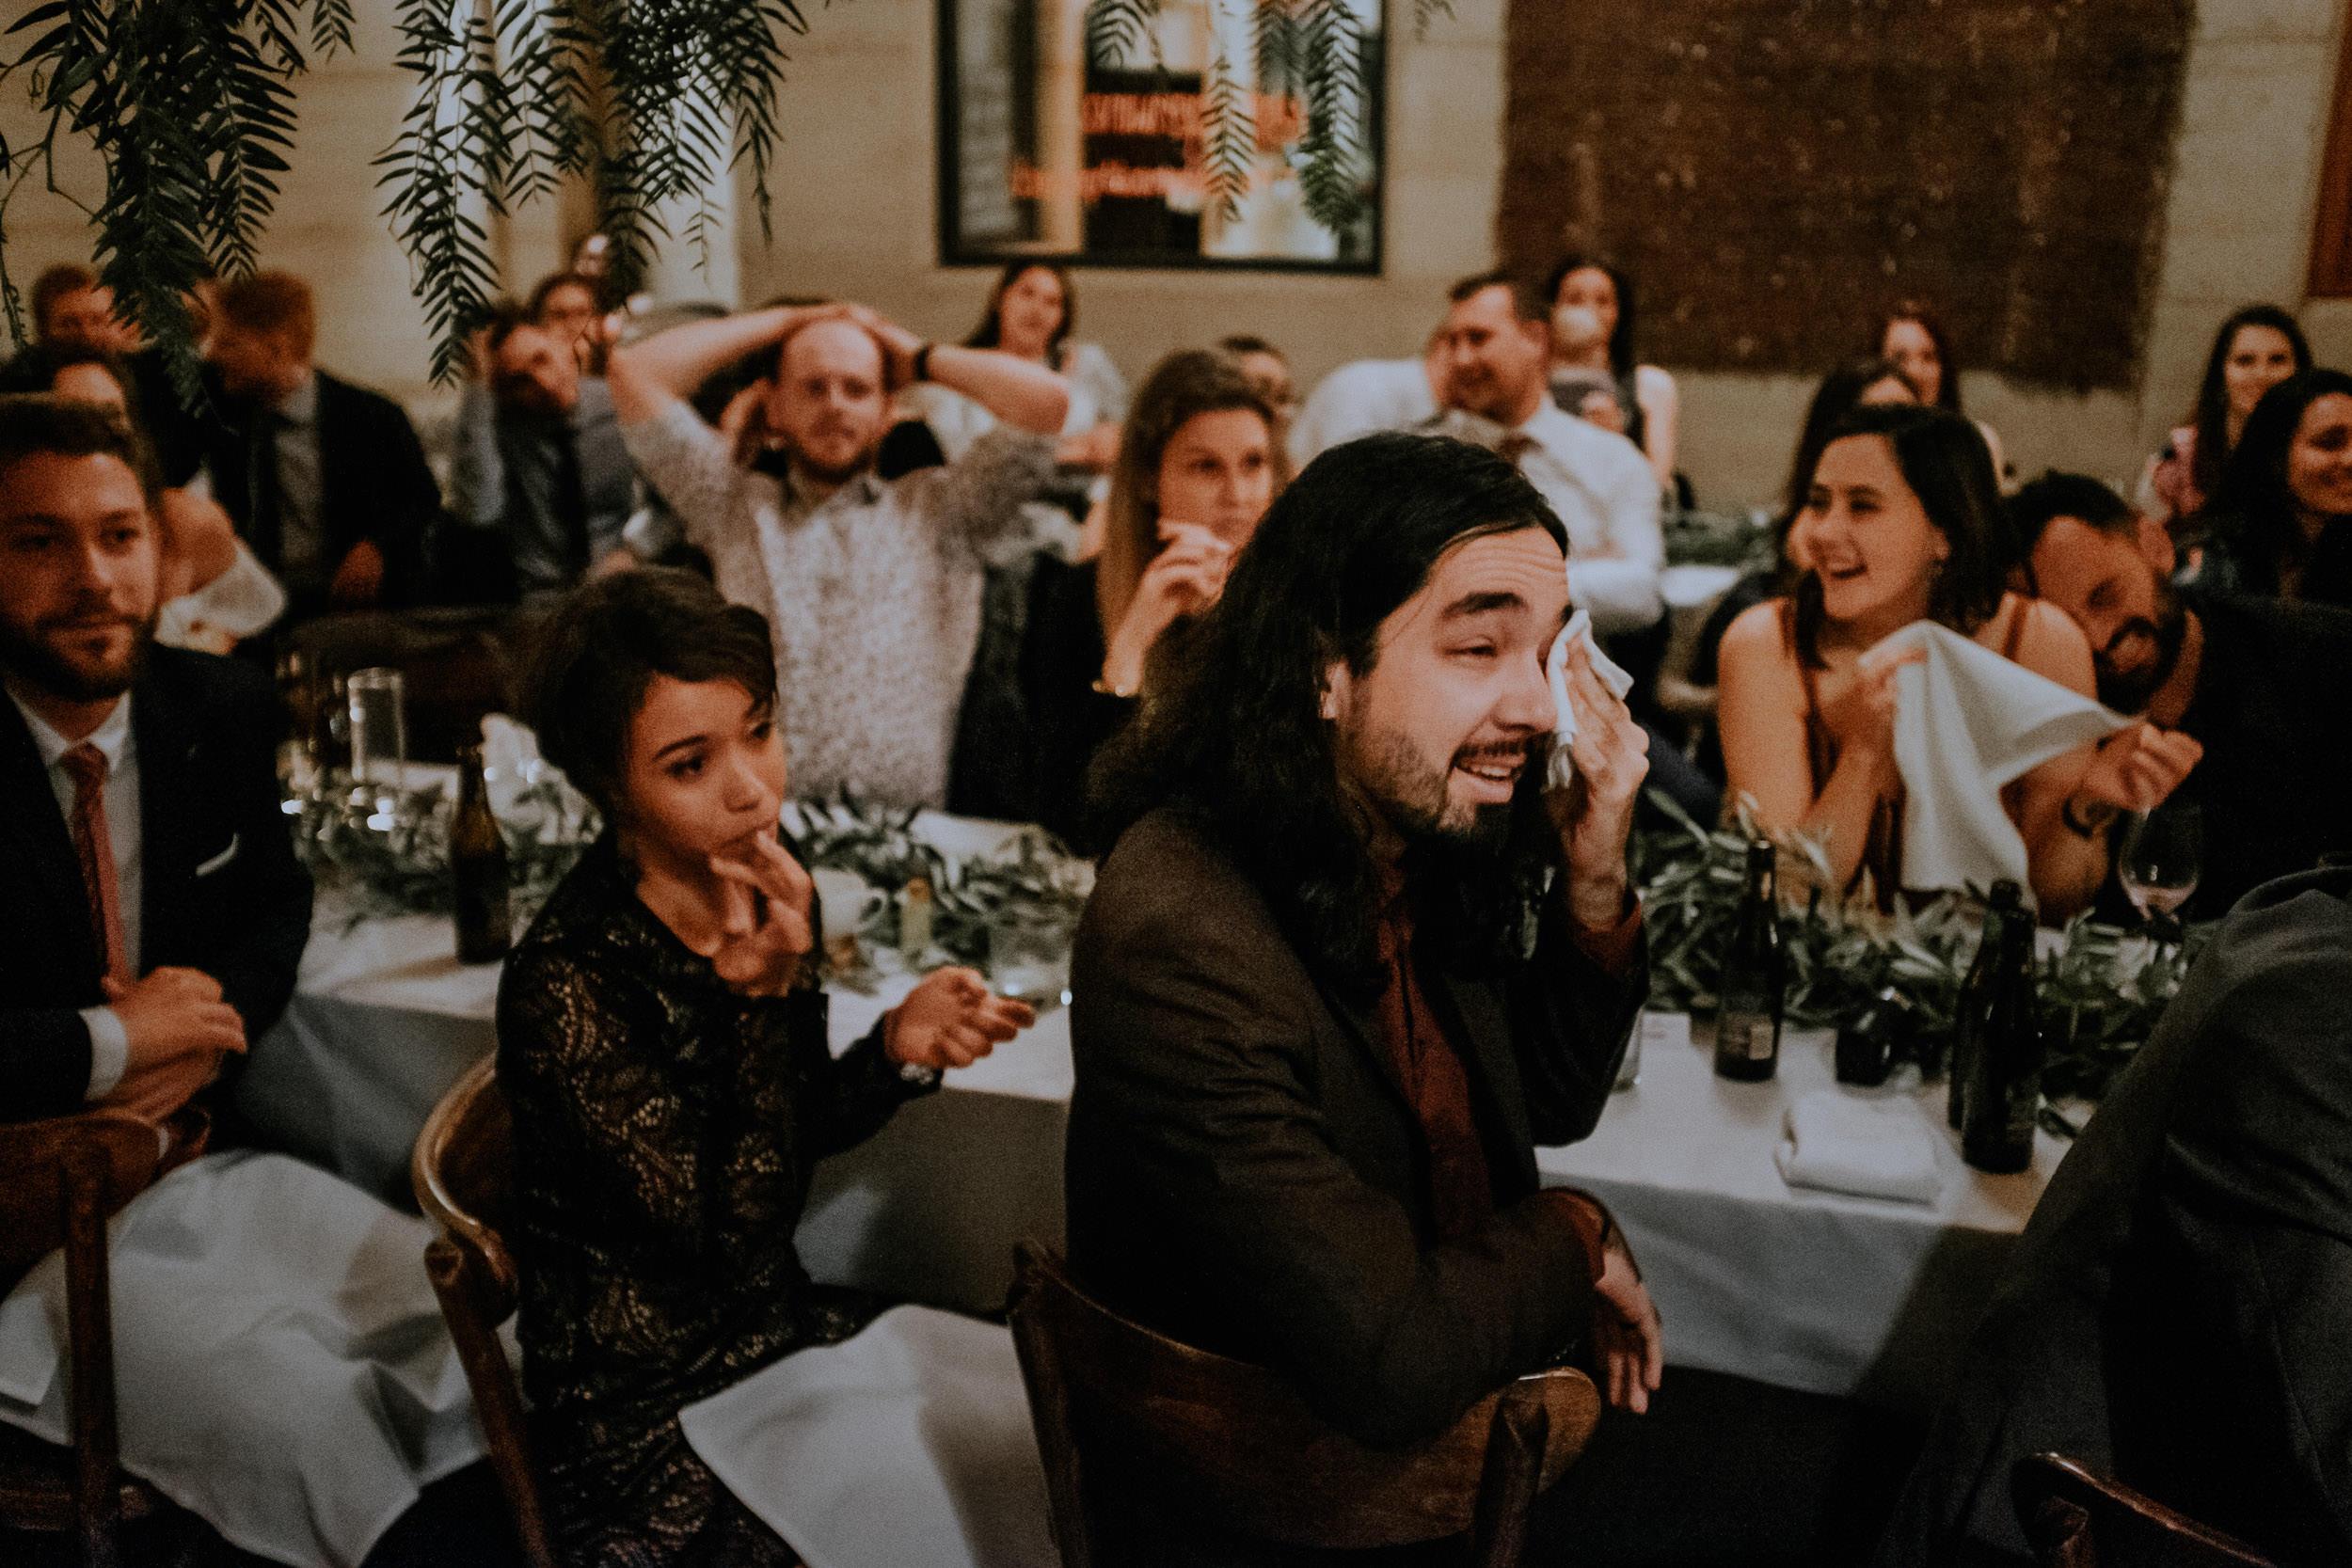 s+j_top_elopement wedding photography_kings & thieves_blog - 537.jpg